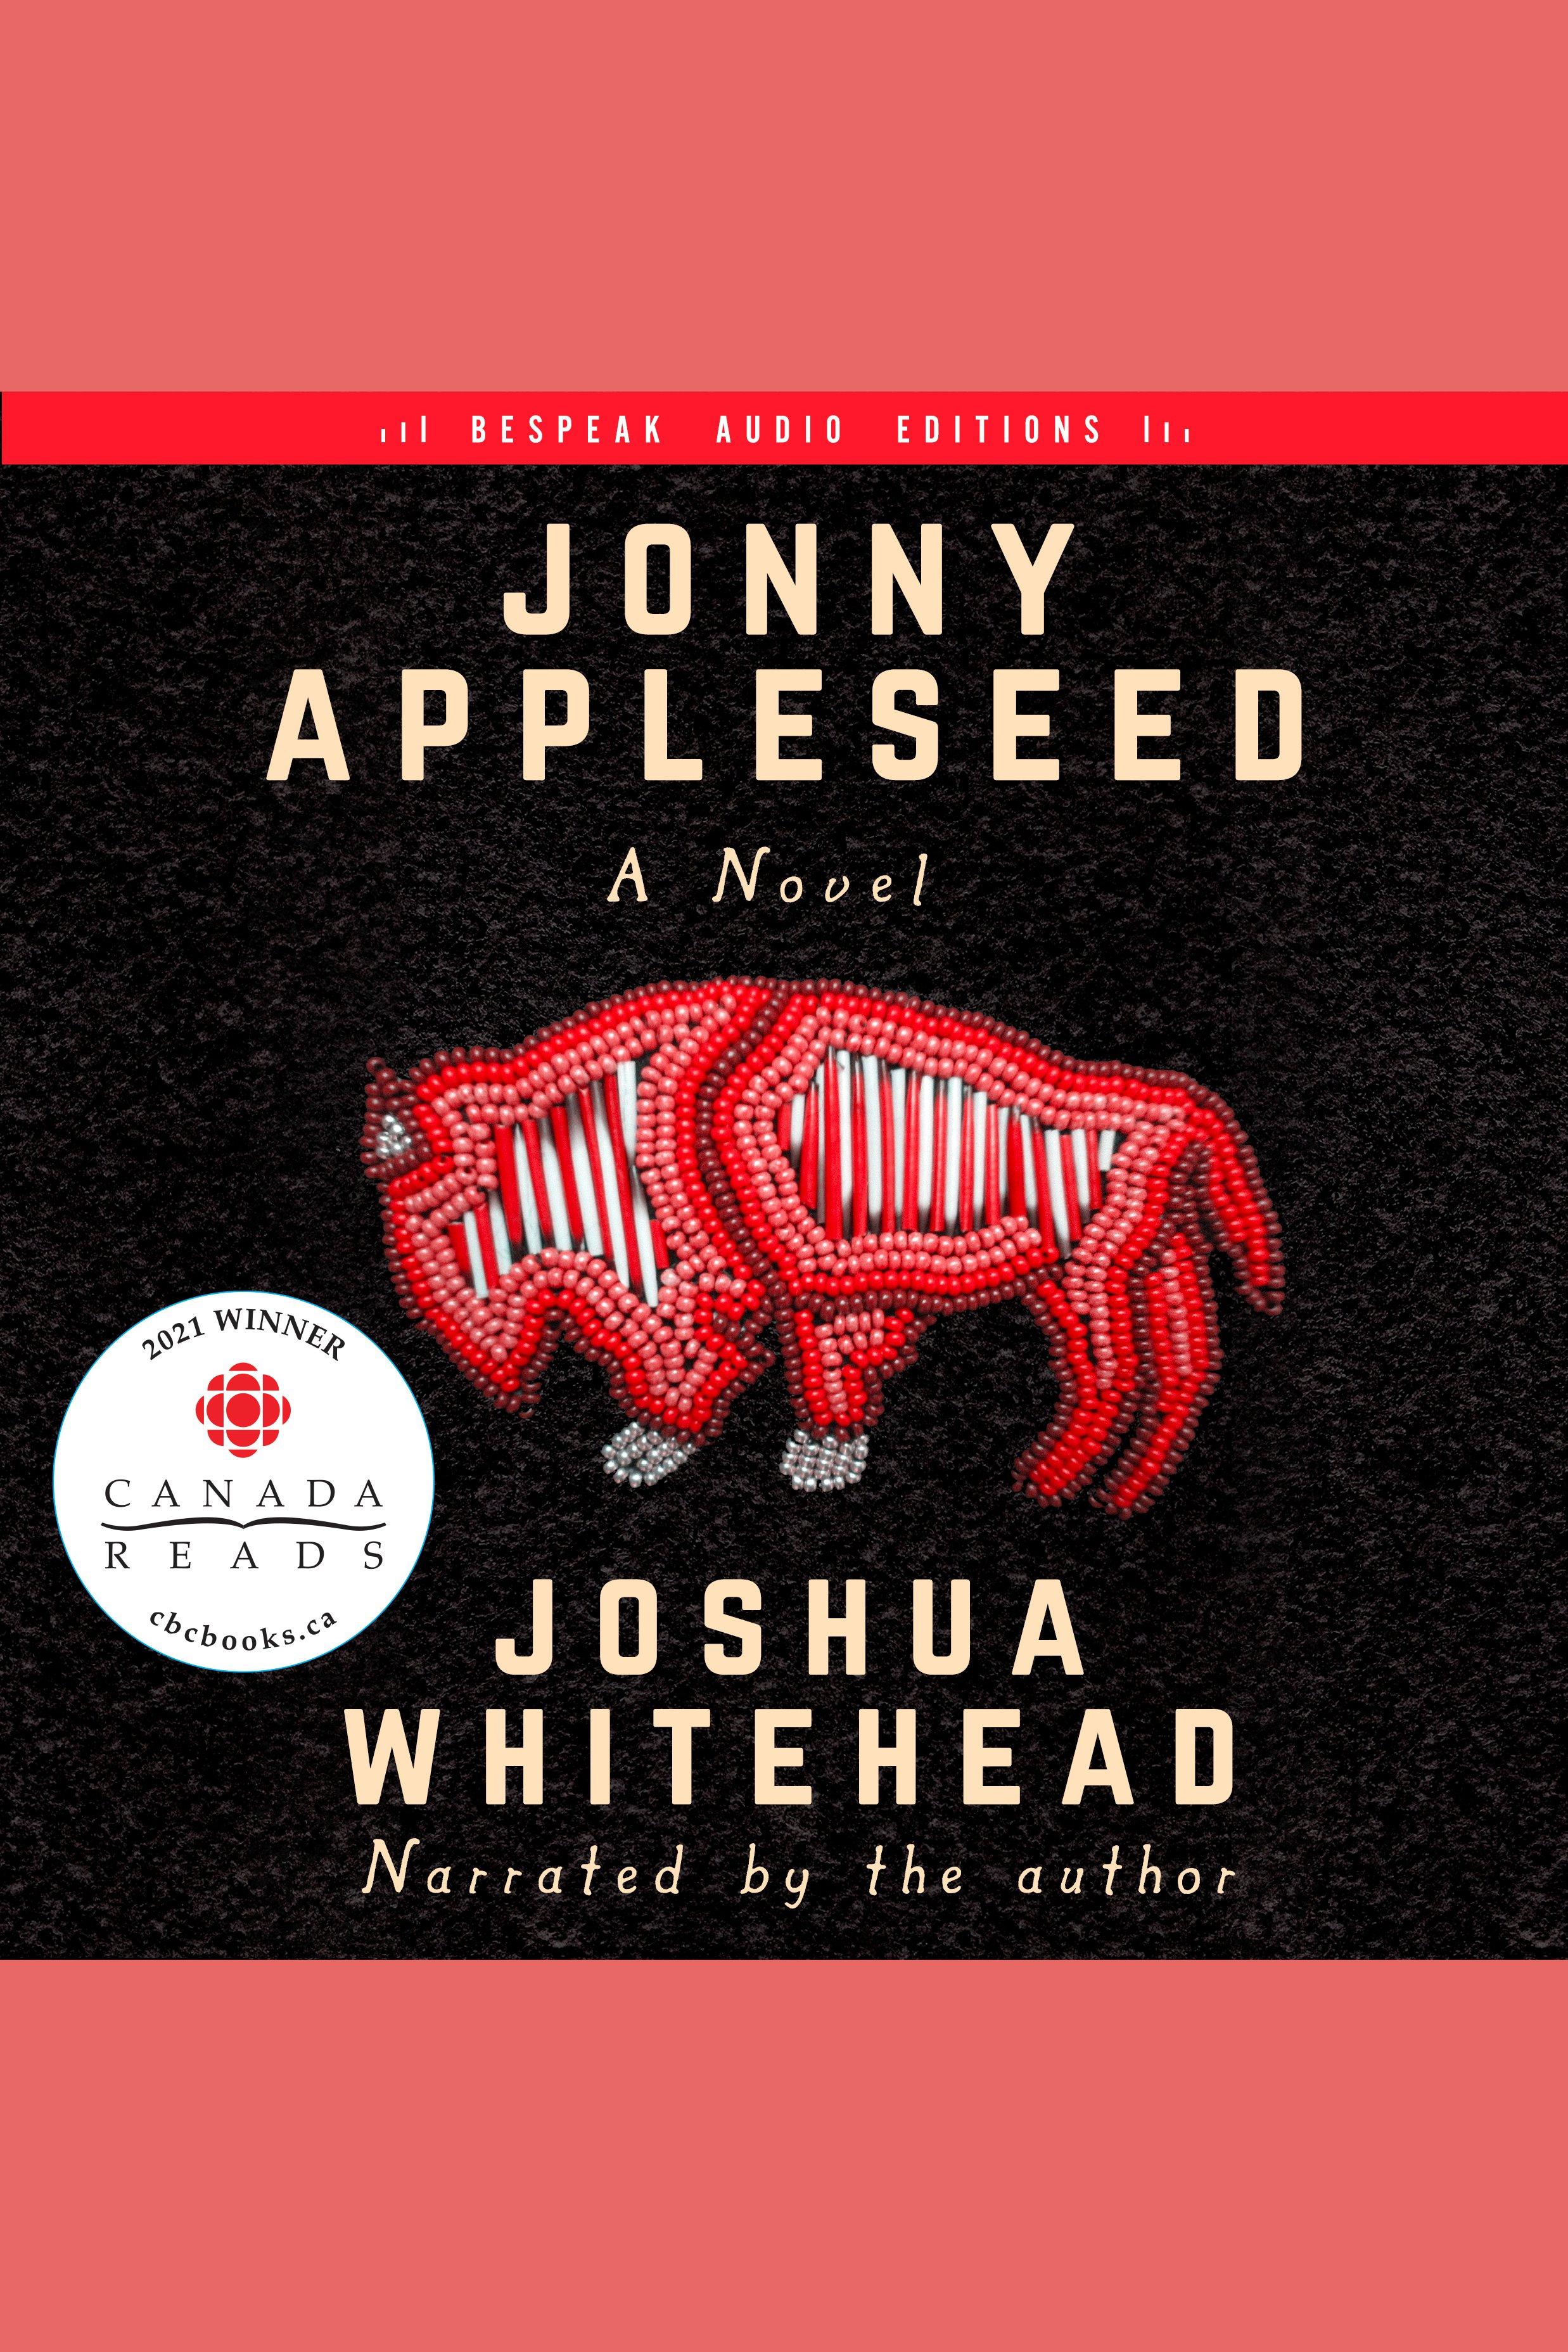 Jonny Appleseed A Novel